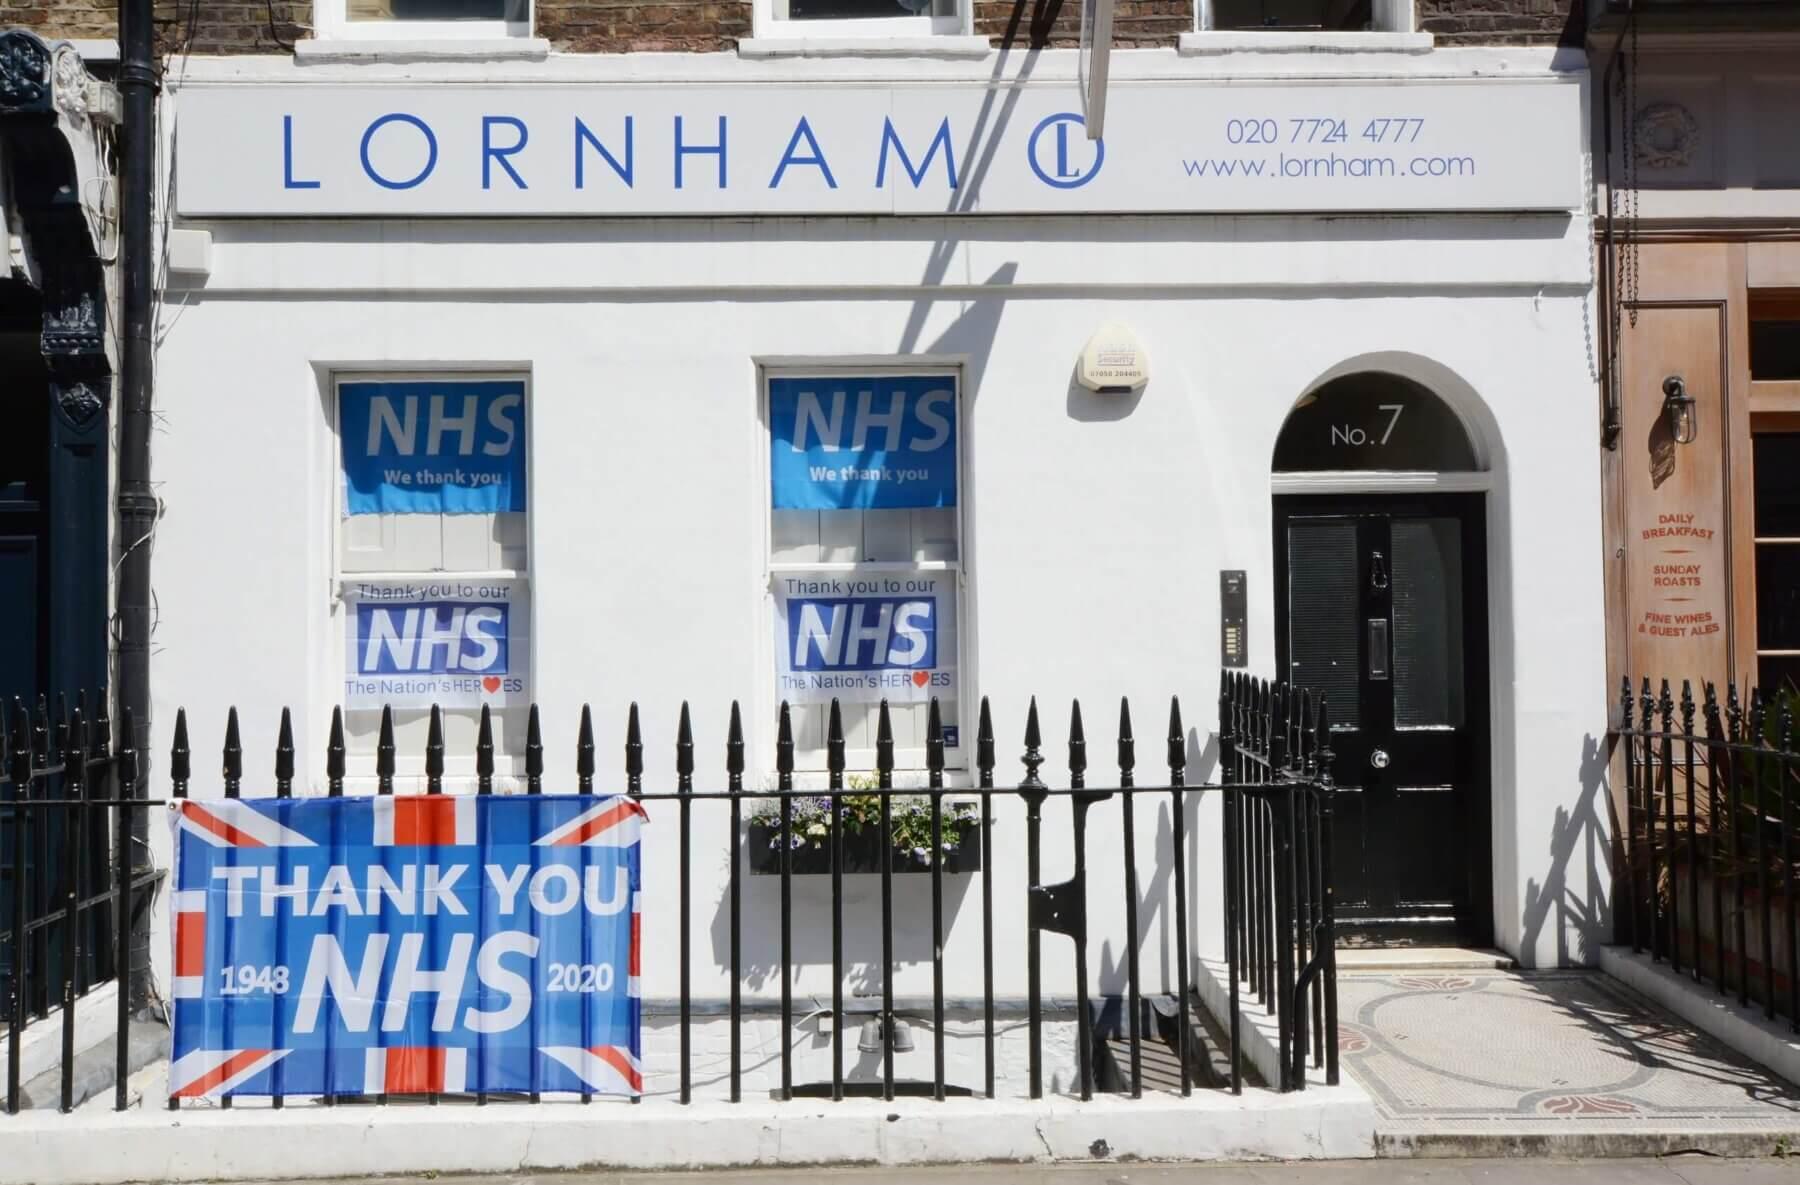 Lornham Supporting NHS